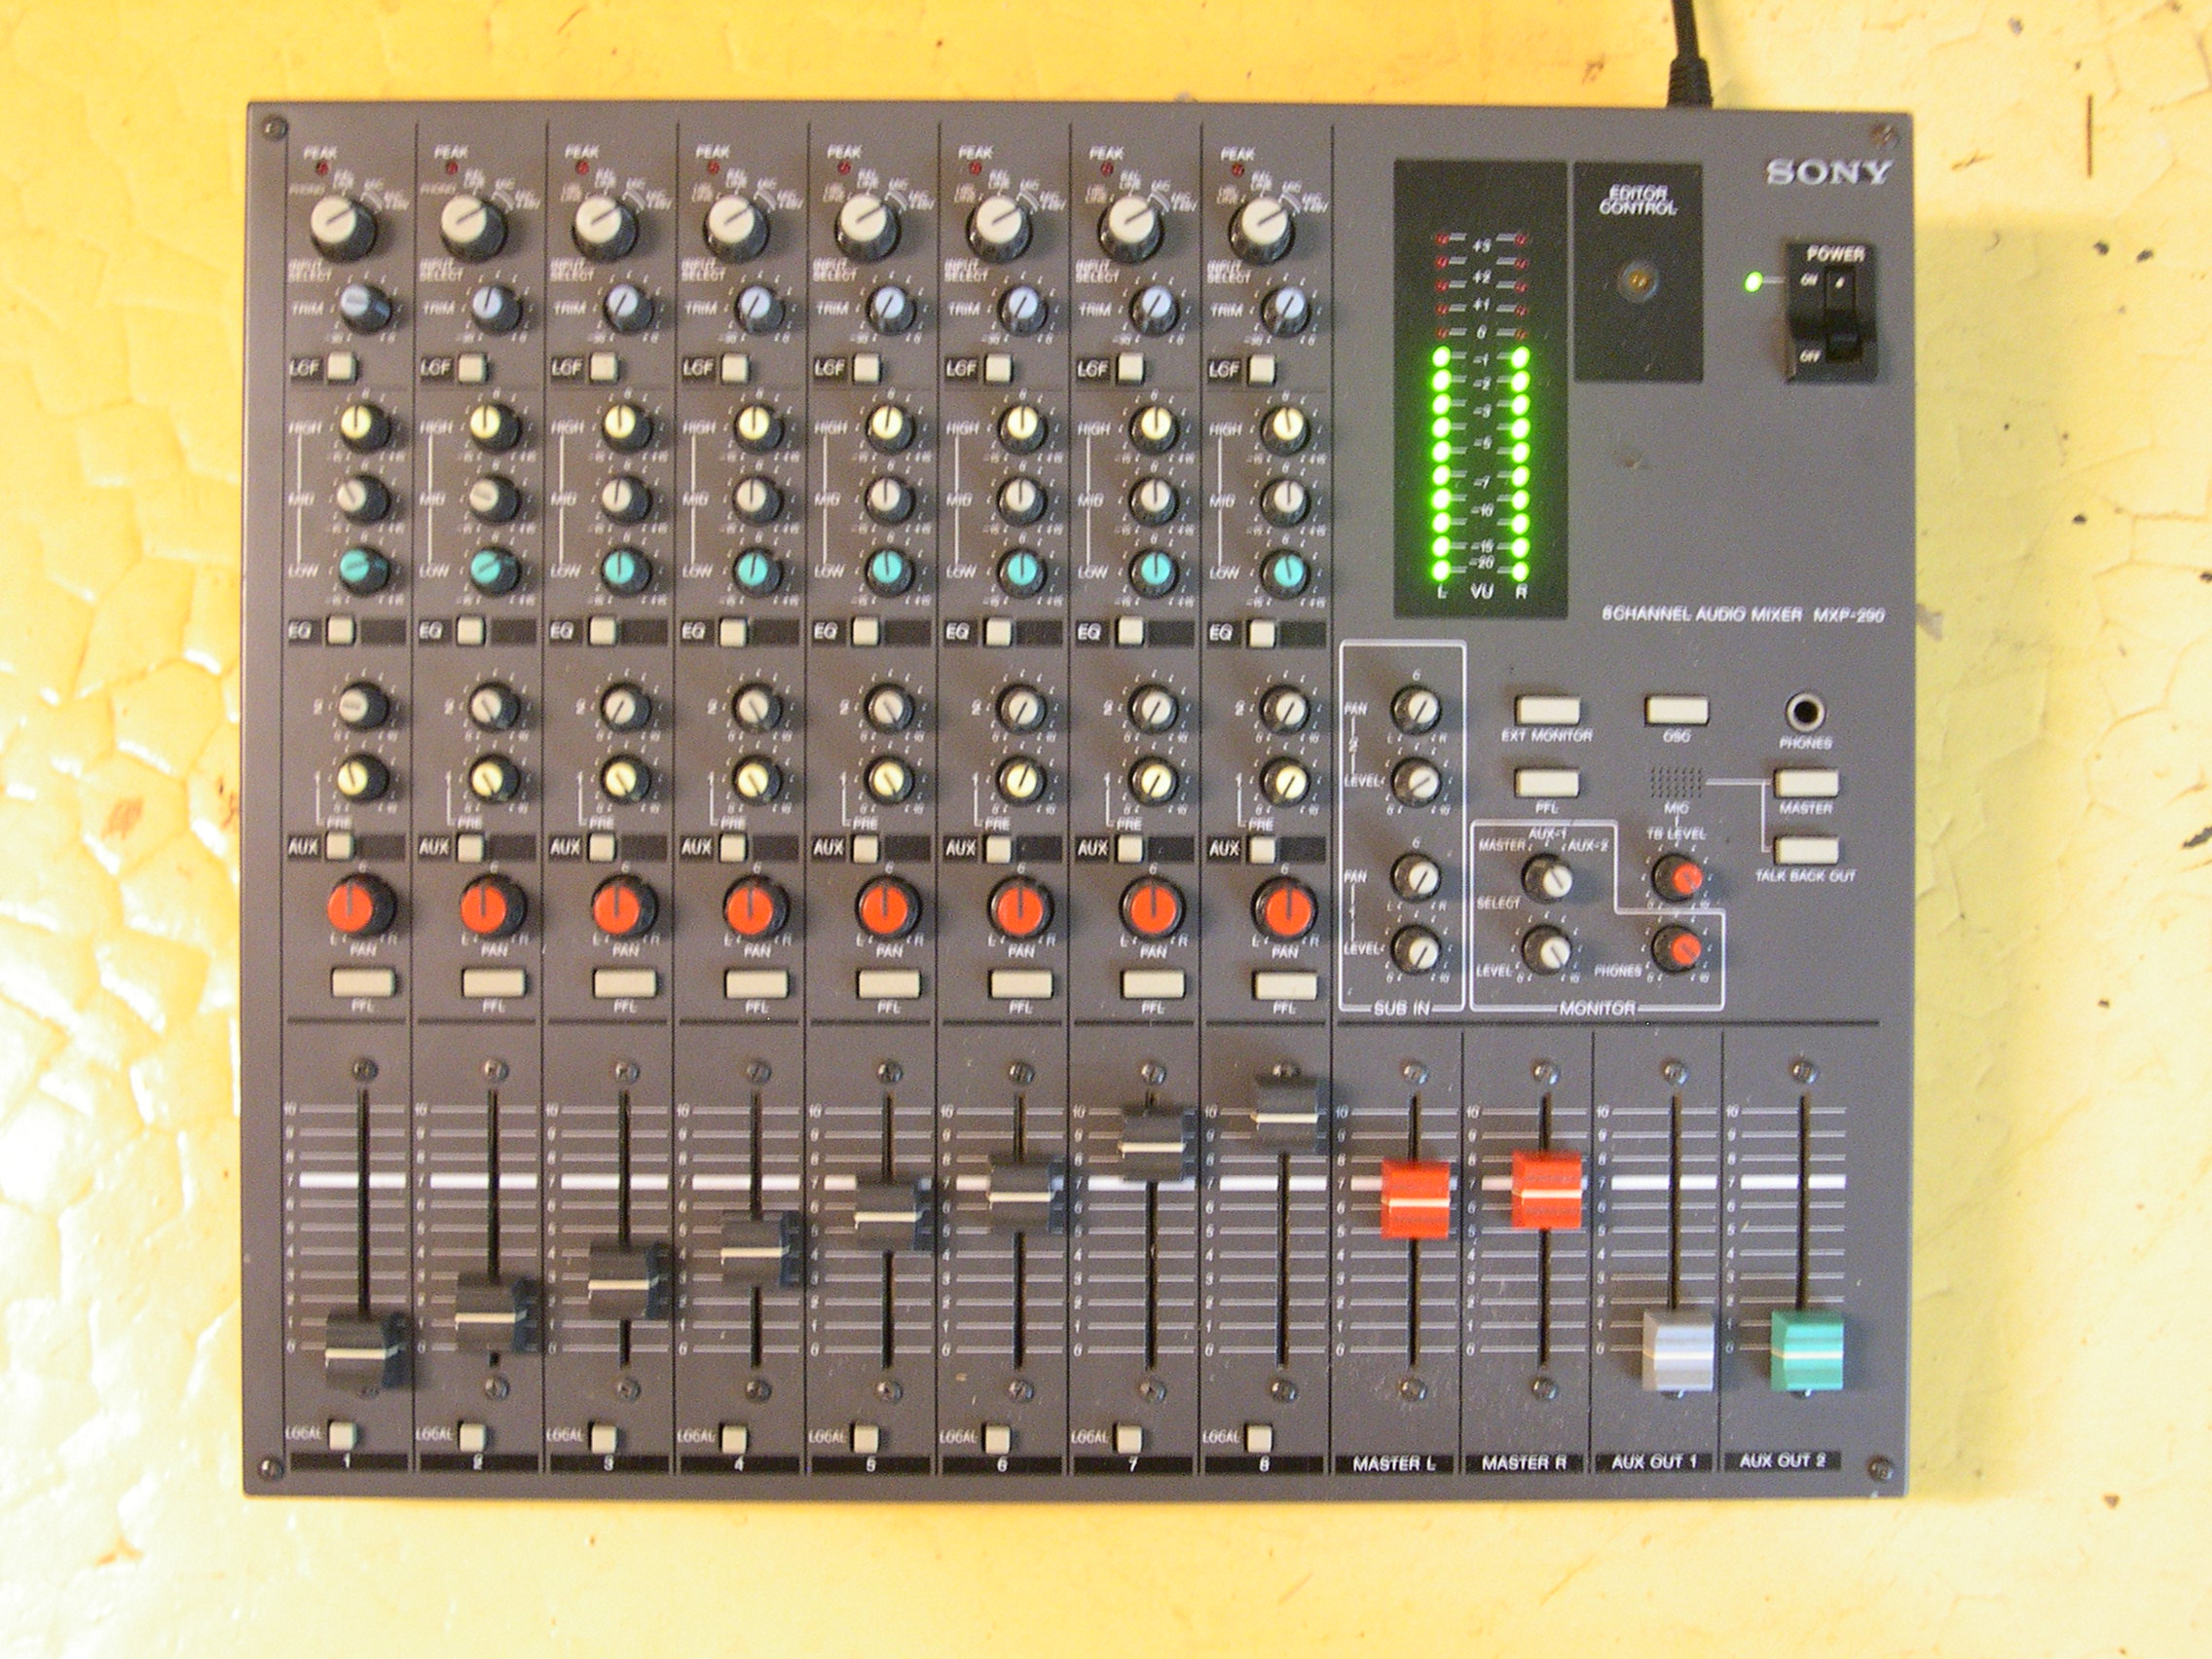 sony mxp 290 image 765382 audiofanzine rh en audiofanzine com Sony DAV HDX576WF Manual Sony Operating Manuals